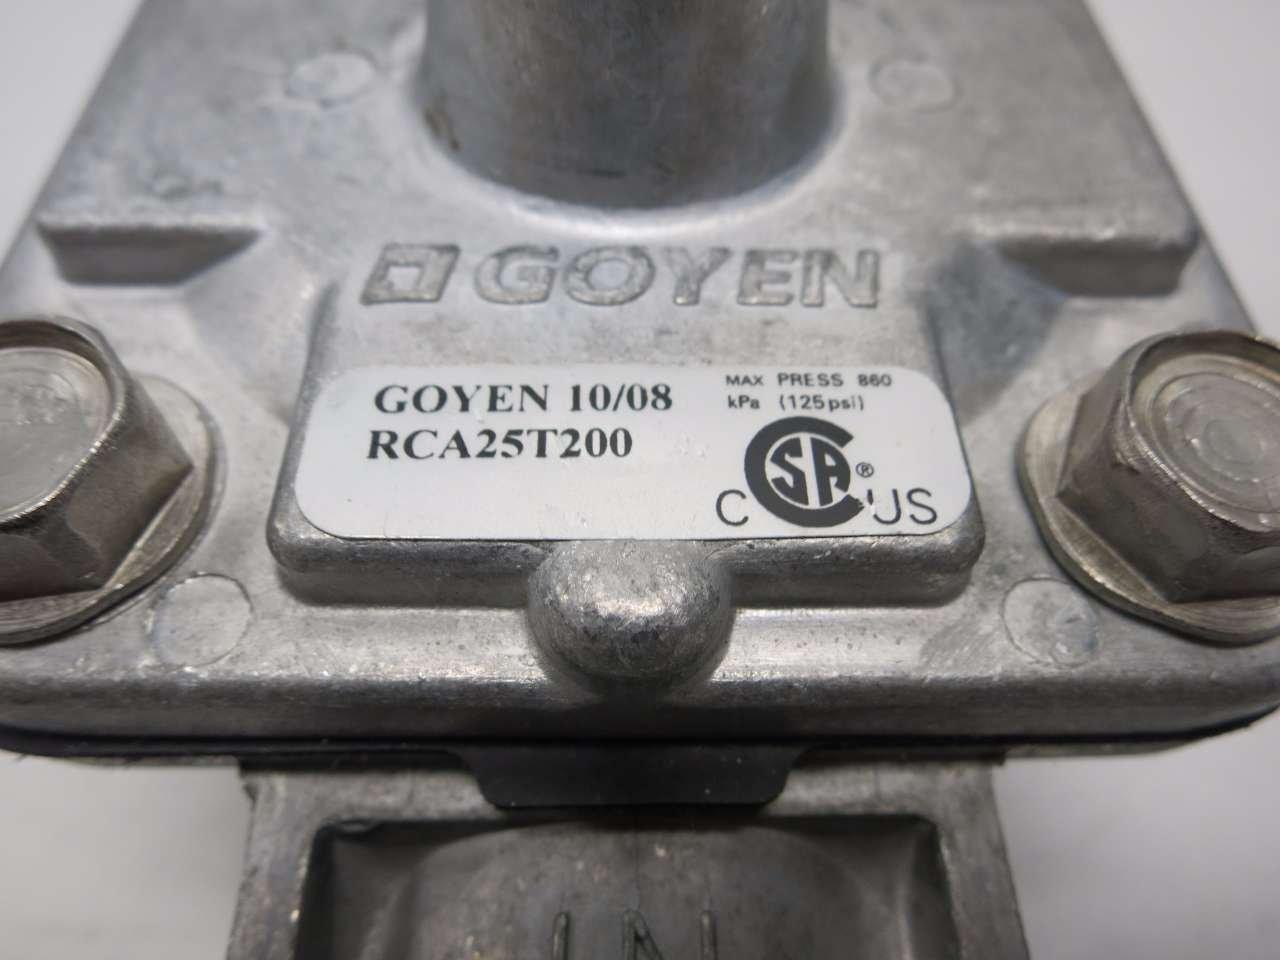 NEW GOYEN RCA25T200 125PSI 1 IN NPT THREADED DIAPHRAGM VALVE D500122